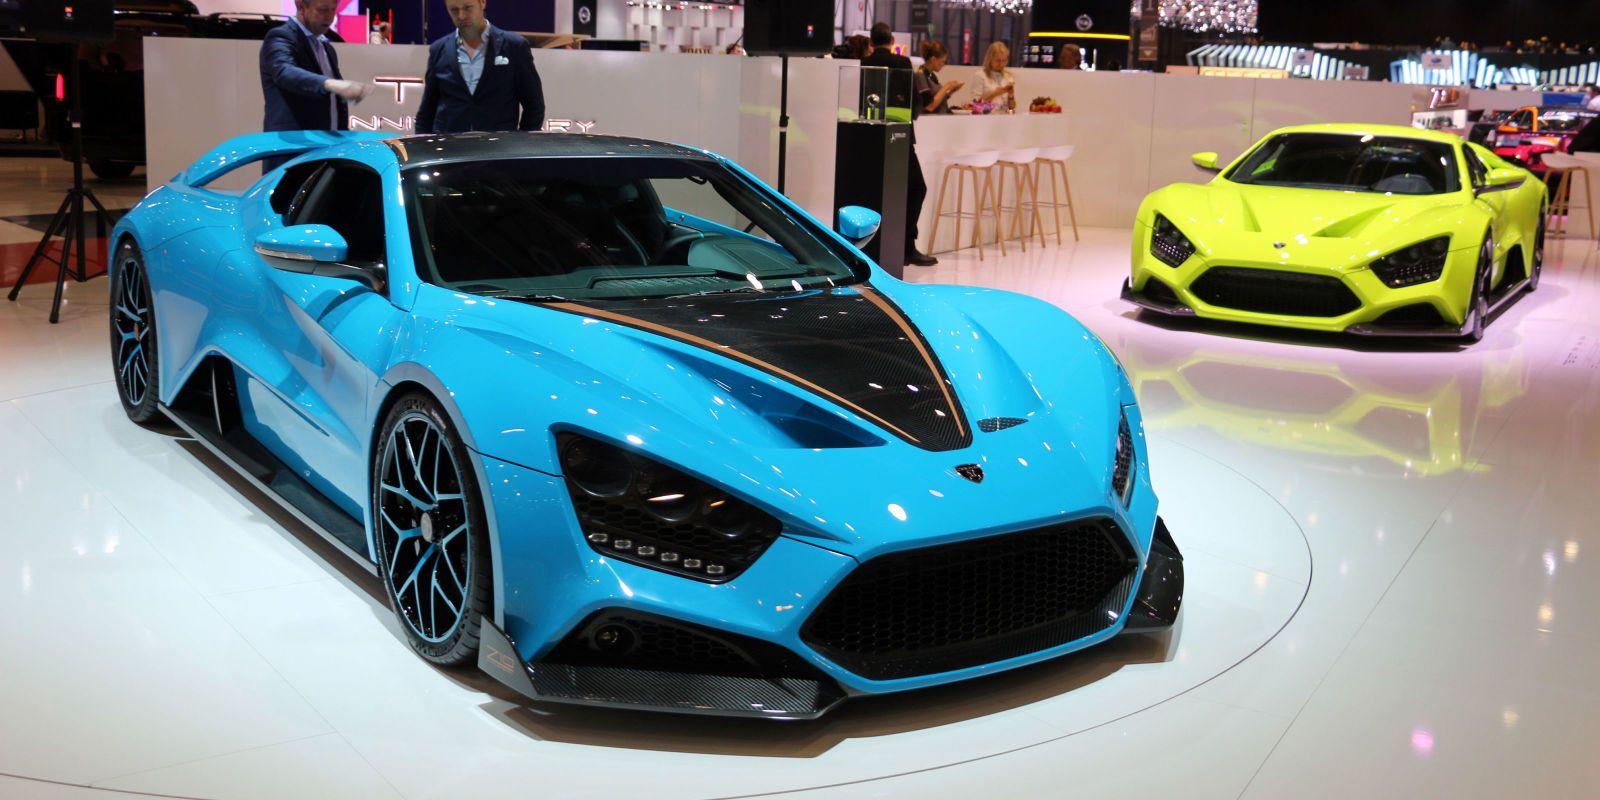 Meet The Company That S Made 11 Cars In 10 Years Autos Deportivos Autos Exoticos Y Motos Deportivas